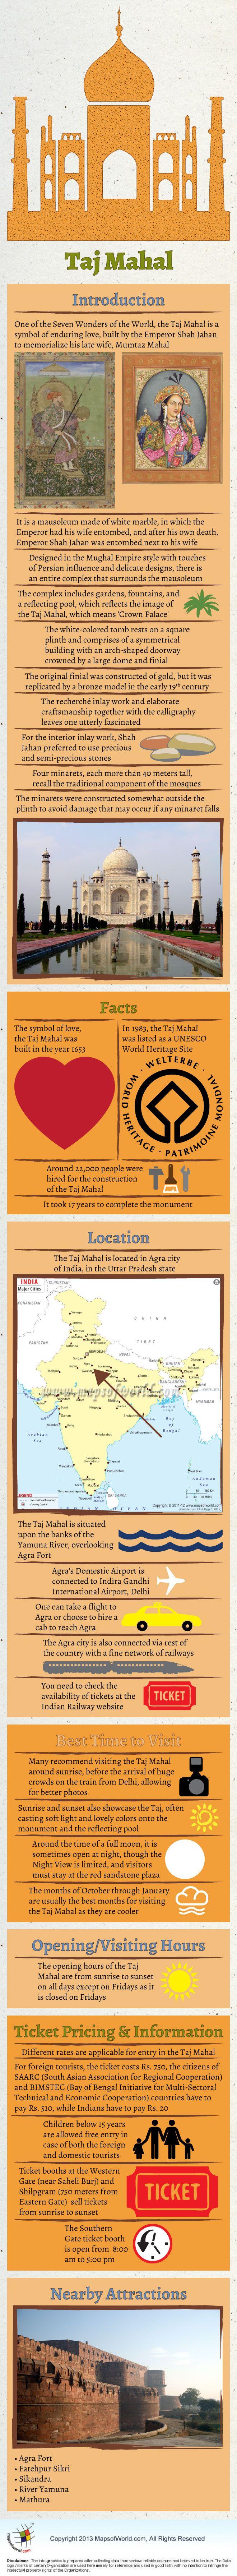 Taj Mahal #Infographic: The symbol of #love, the Taj Mahal was built in the year 1653. Read more: http://www.mapsofworld.com/travel/destinations/india/taj-mahal#ixzz2rmy1lRpc